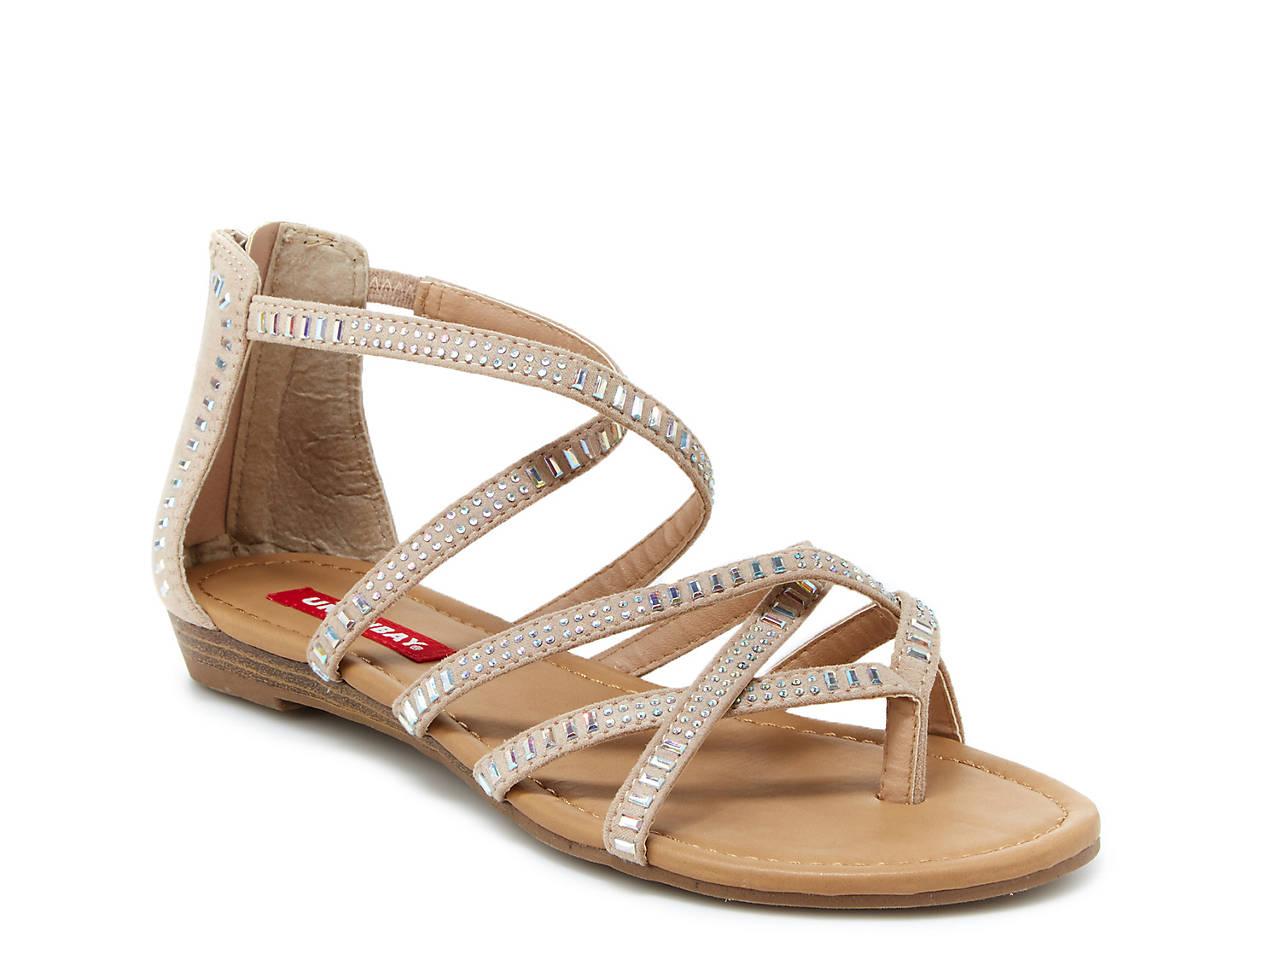 42b5d07116a8 UNIONBAY Soho Gladiator Sandal Women s Shoes